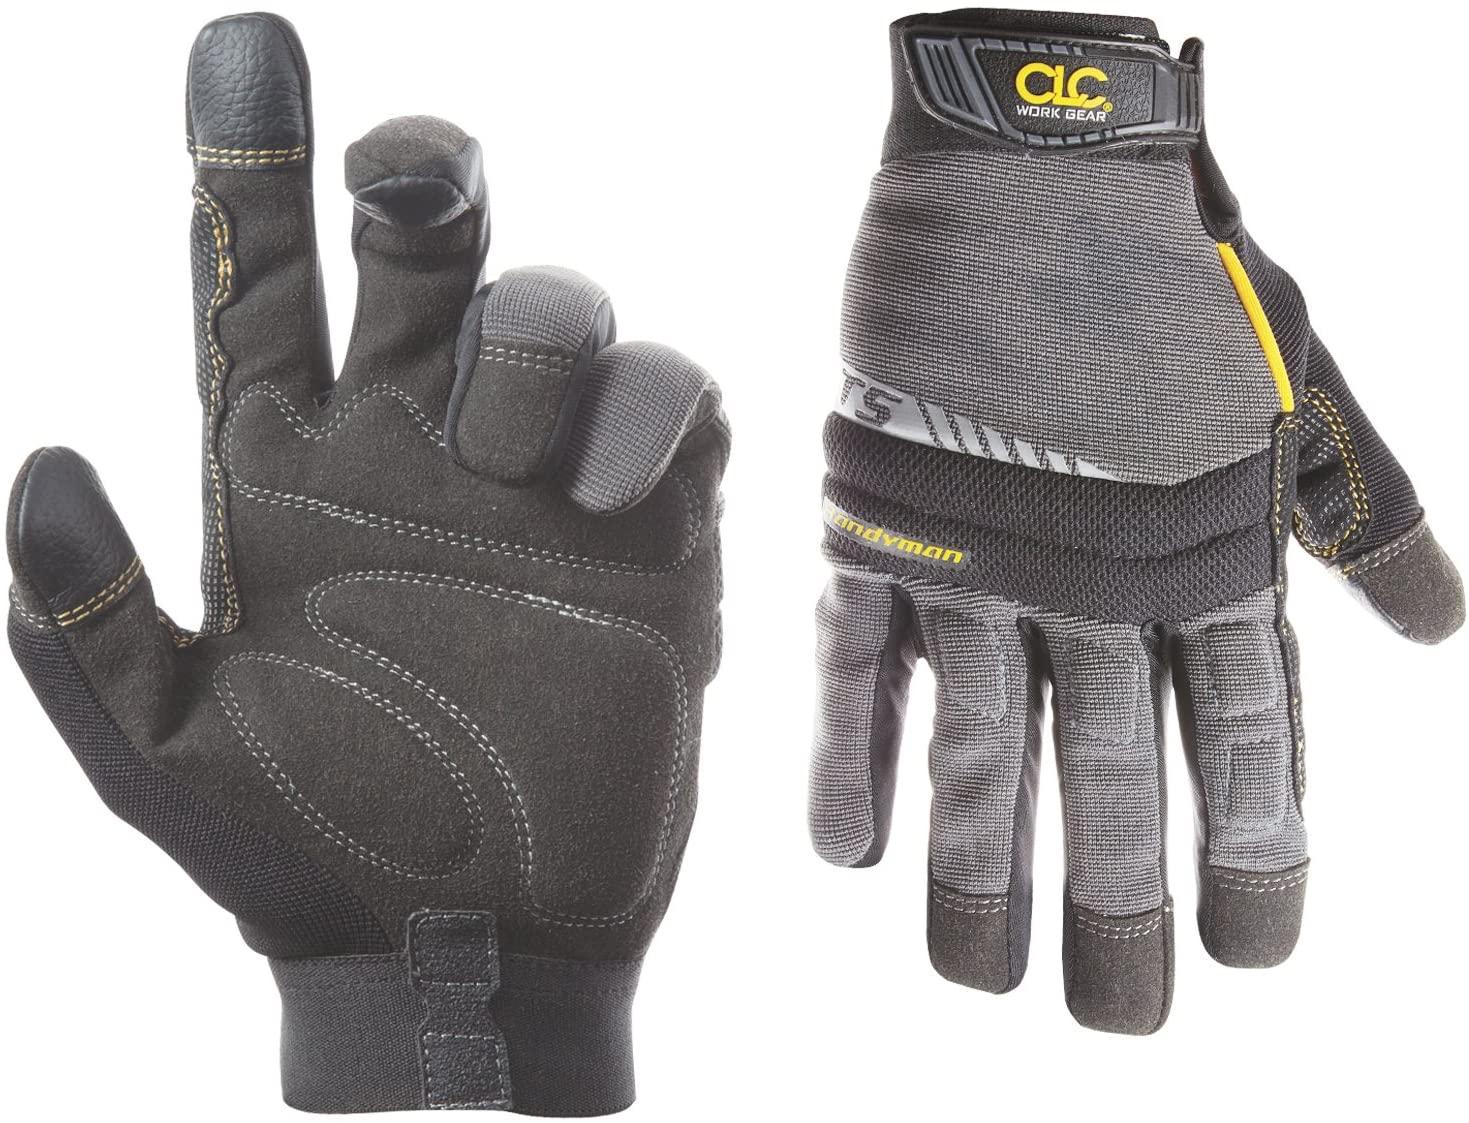 CLC Custom Leathercraft 125M Handyman Flex Grip Work Gloves, Shrink Resistant, Improved Dexterity, Tough, Stretchable, Excellent Grip,Medium